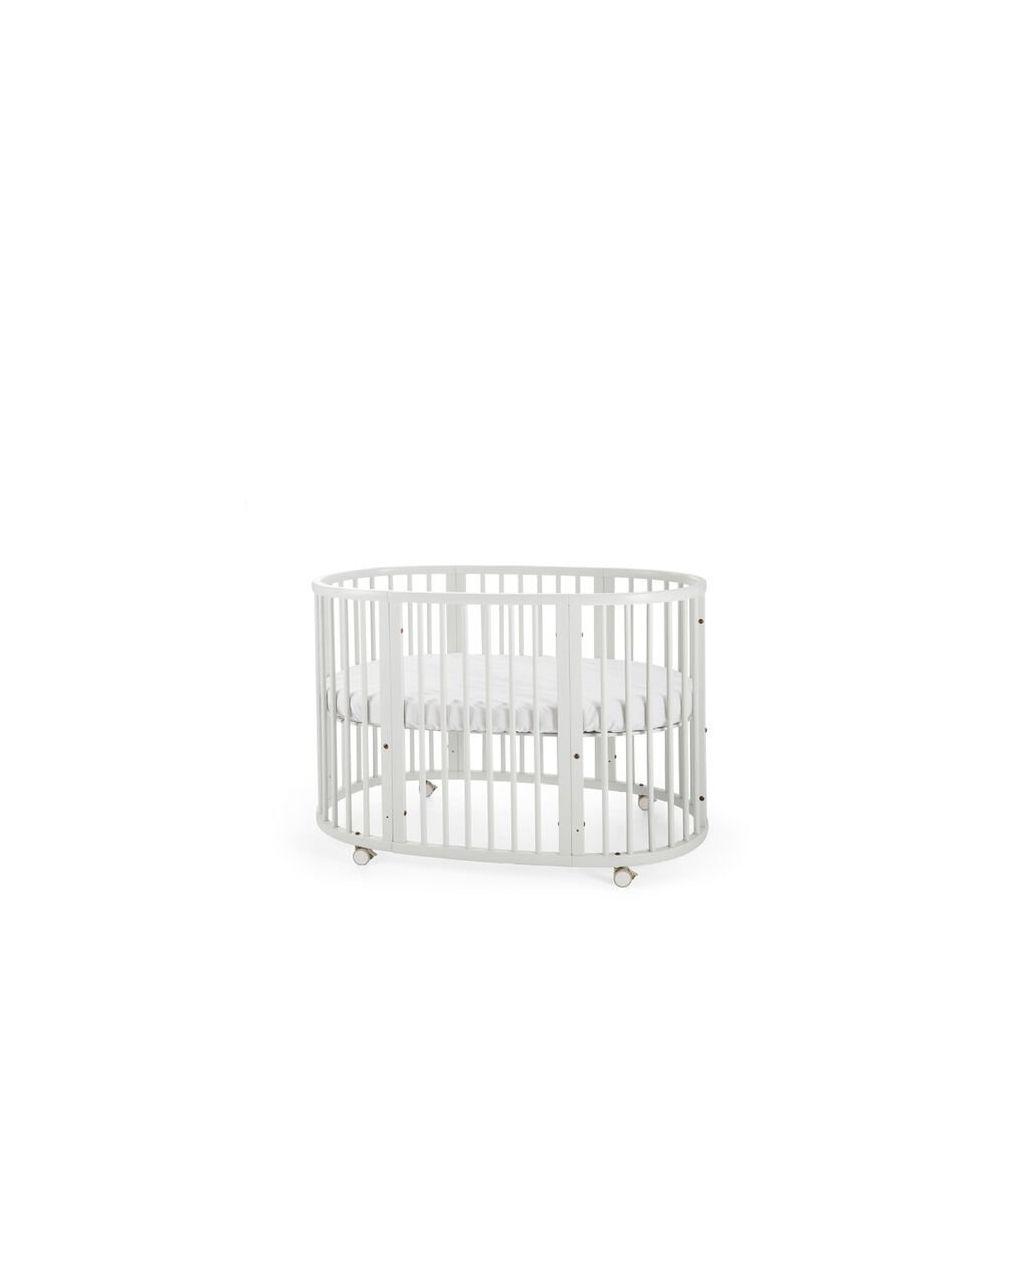 Extensão para cama de bebê stokke® sleepi ™ 120 cm branca - Stokke